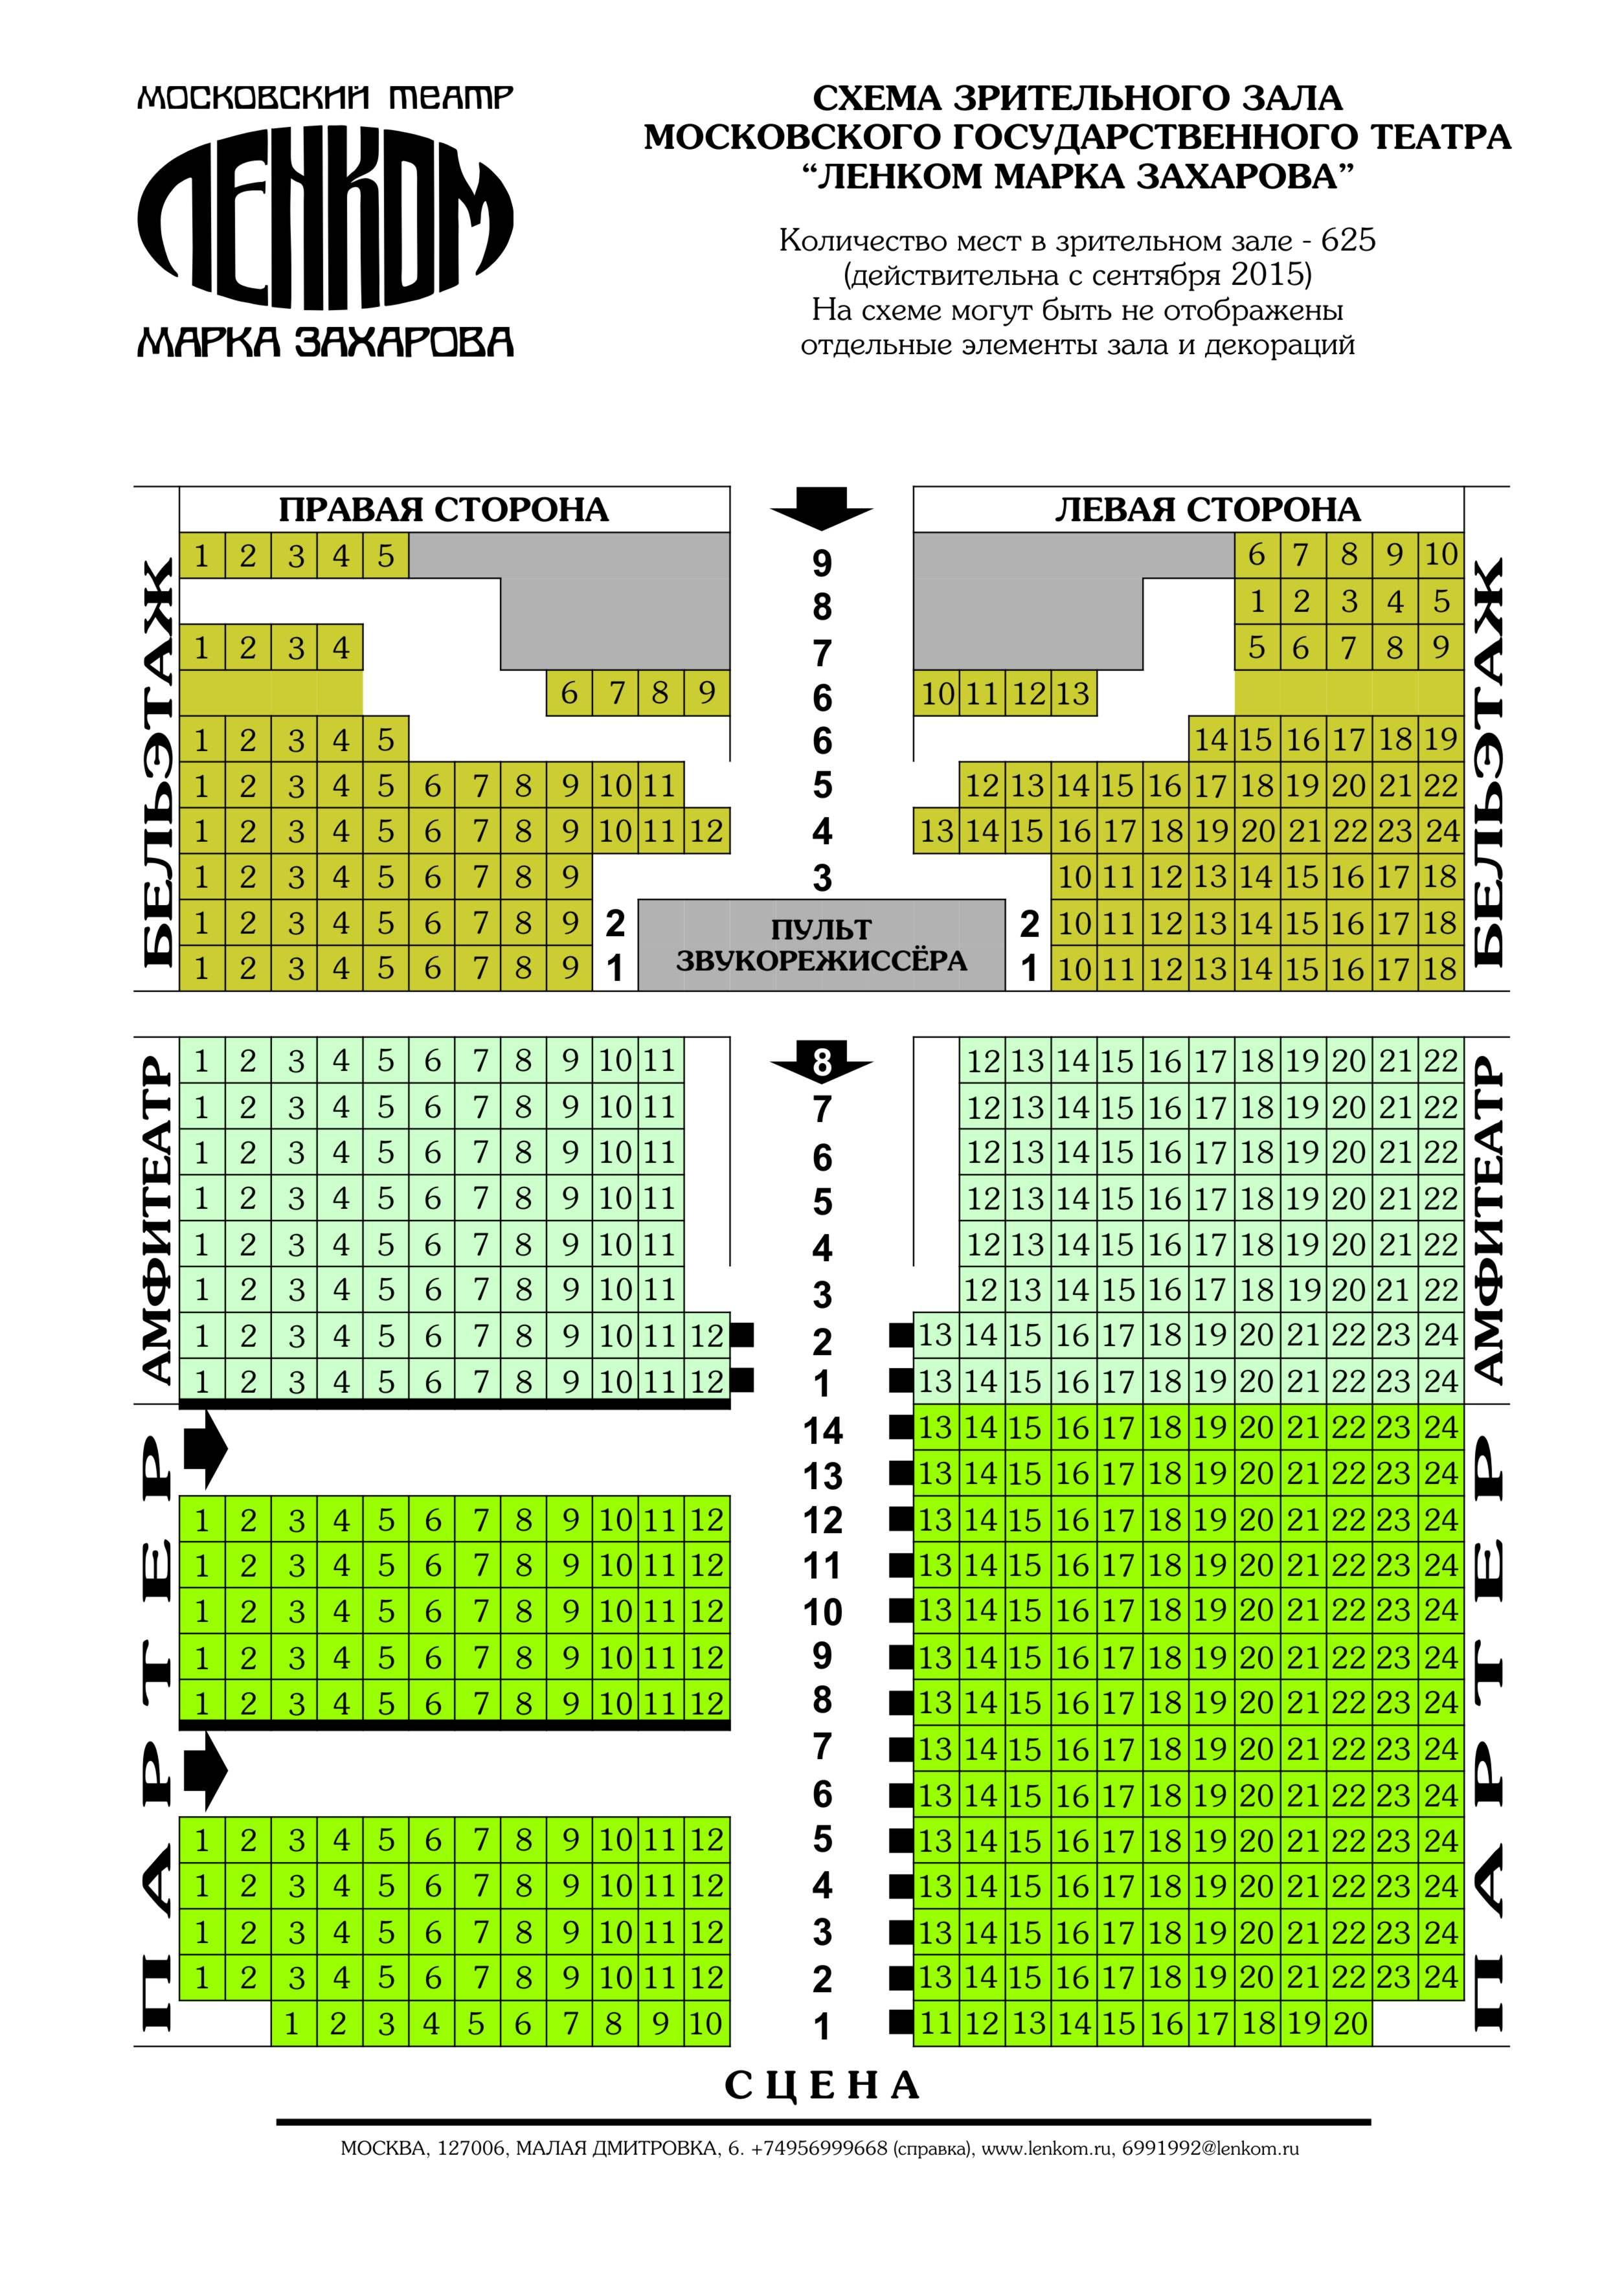 Схема зрительного зала театра ленком